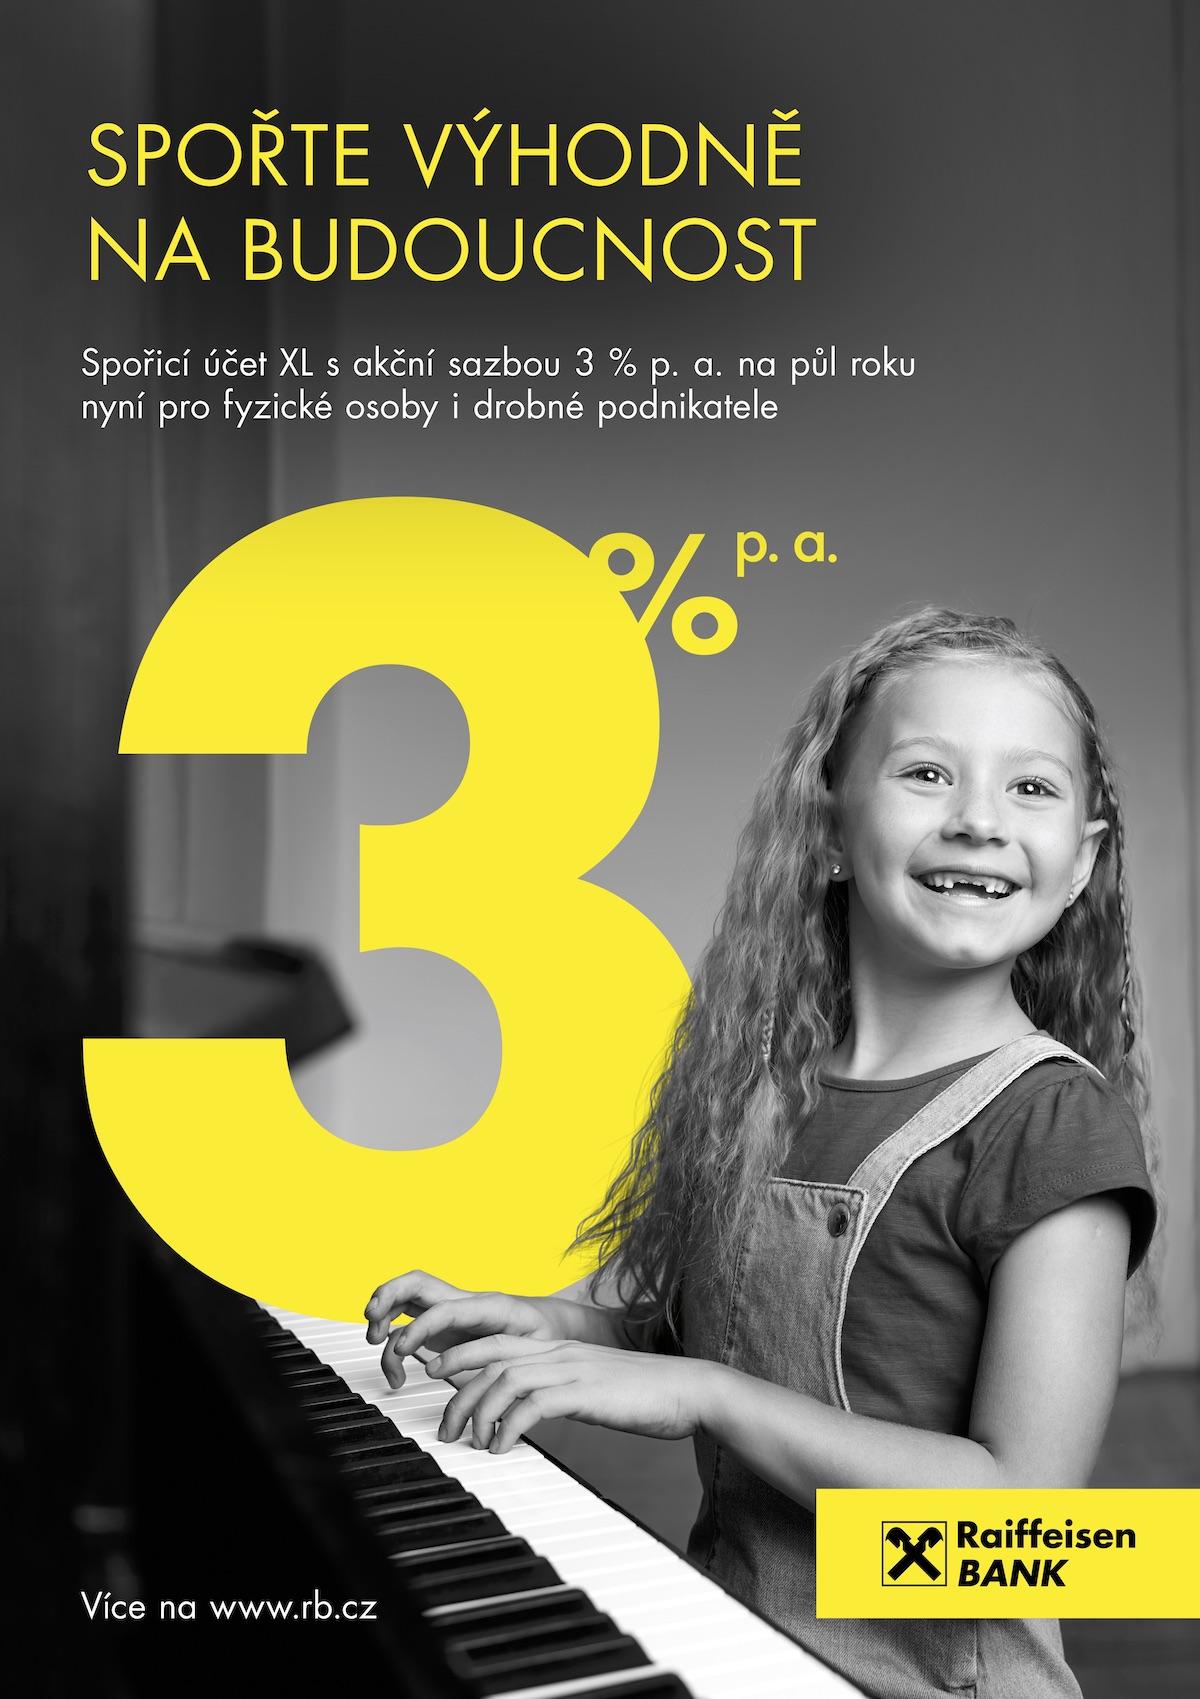 Raiffeisenbank: Respekt: Spořicí účet (DDB Prague)